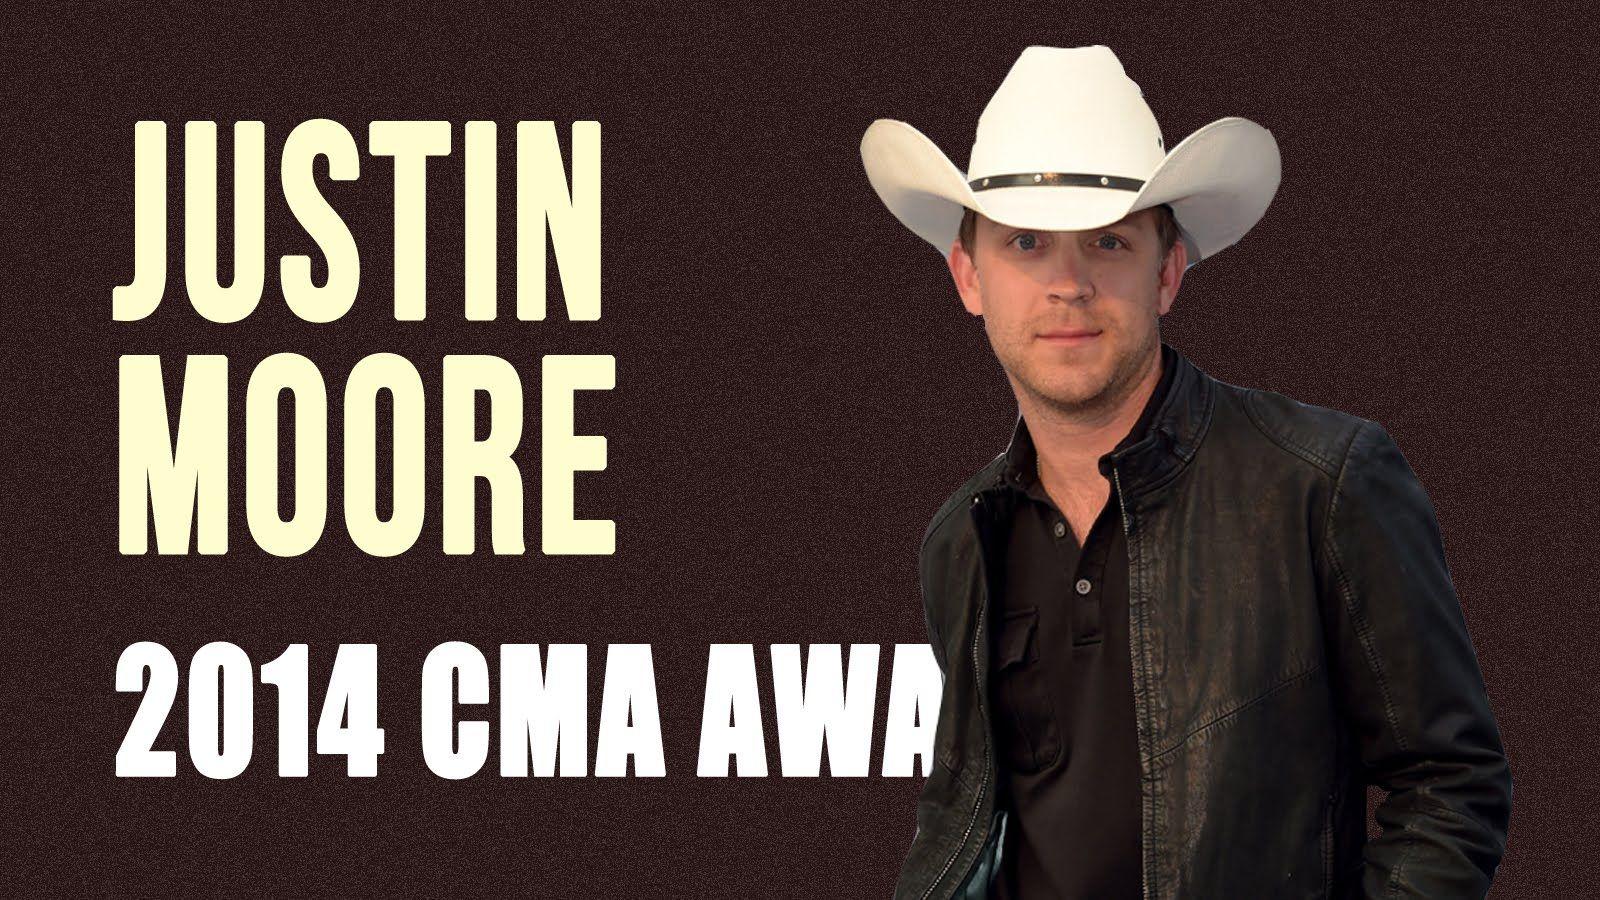 Justin Moore S Baby Not Letting Him Sleep 2014 Cma Awards